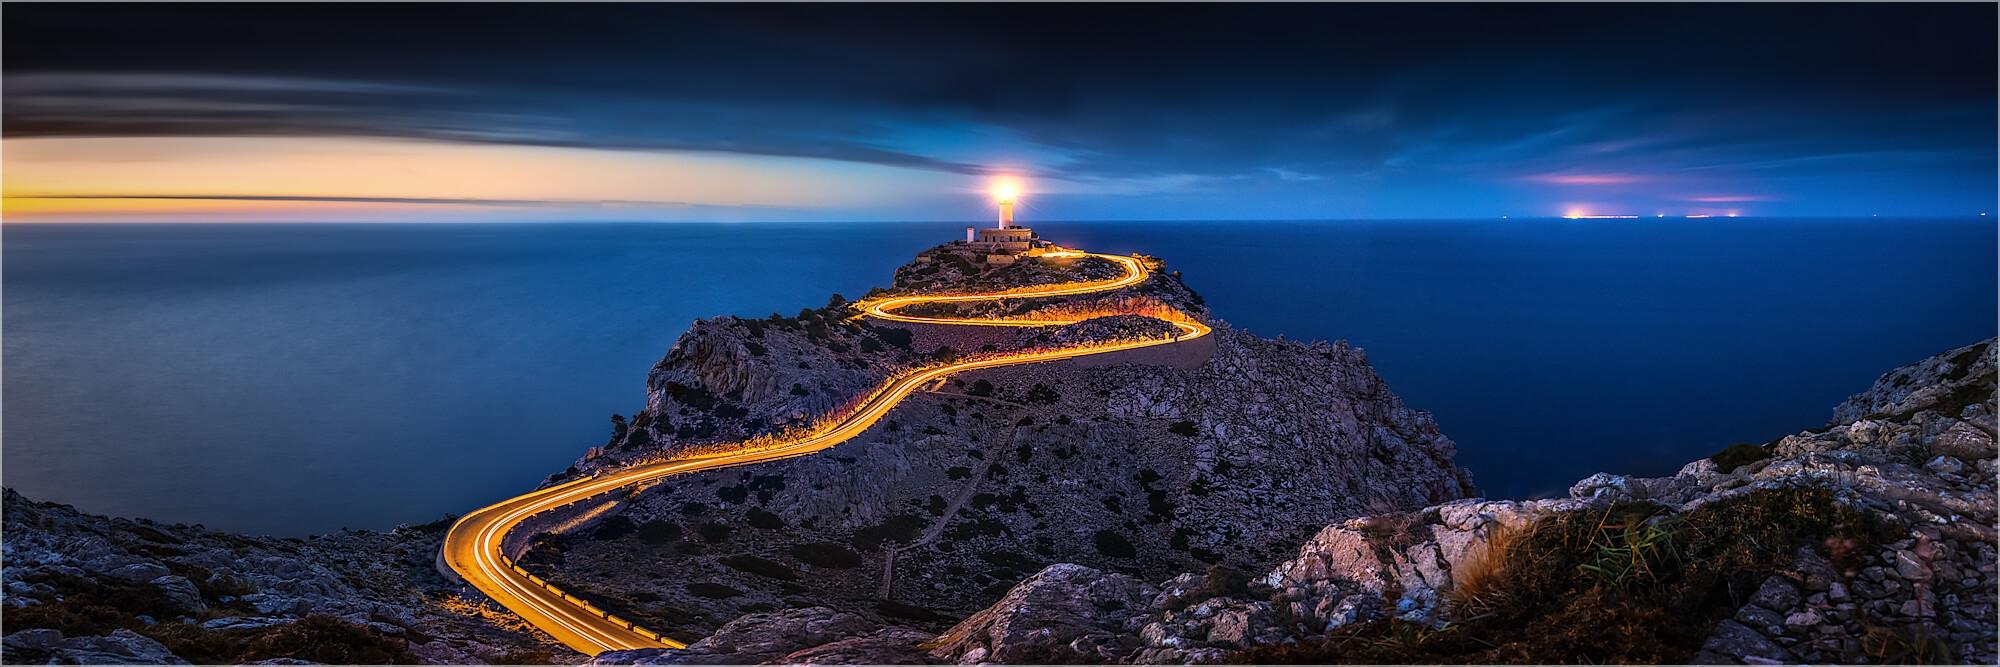 Panoramafoto Leuchtspuren am Cap Formentor Mallorca